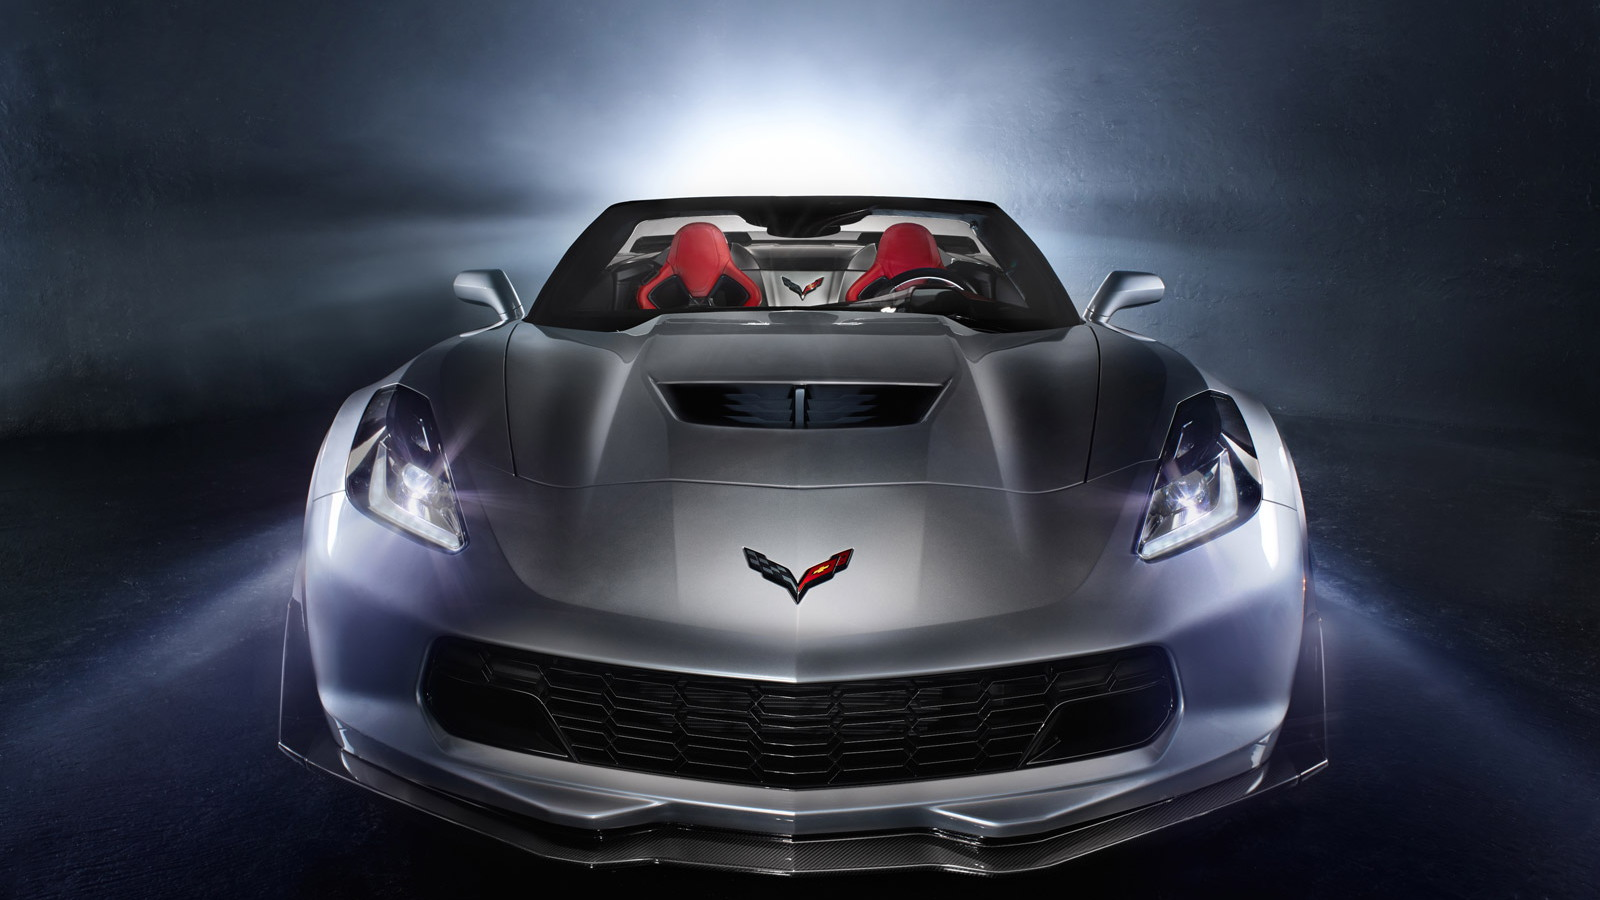 2015 Chevrolet Corvette Z06 Convertible, shot by Dan Wang